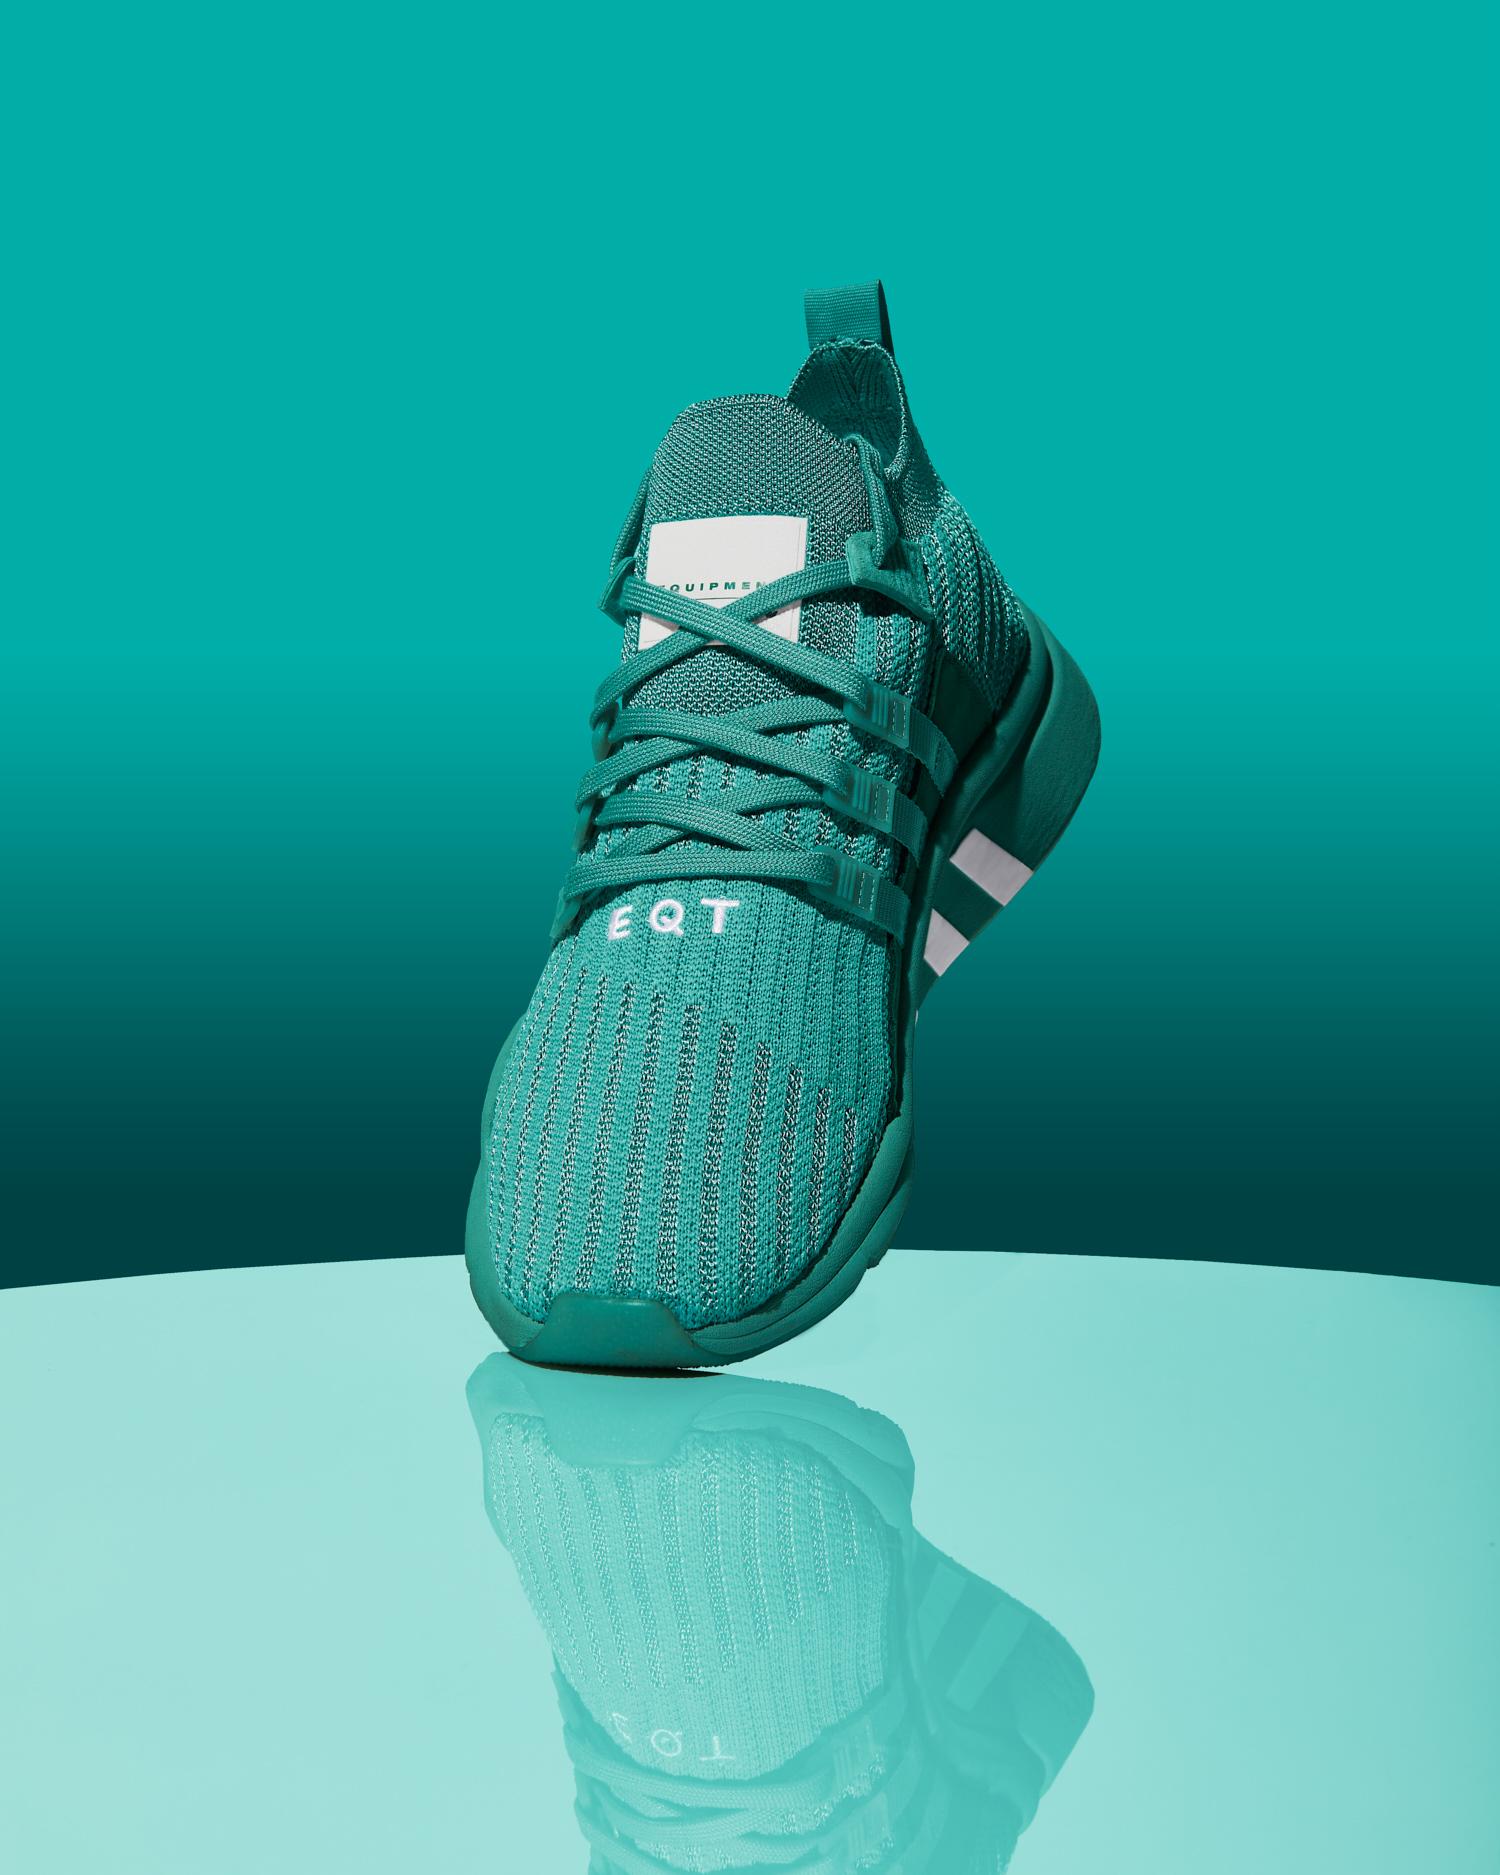 Adidas EQT Simon Mellar